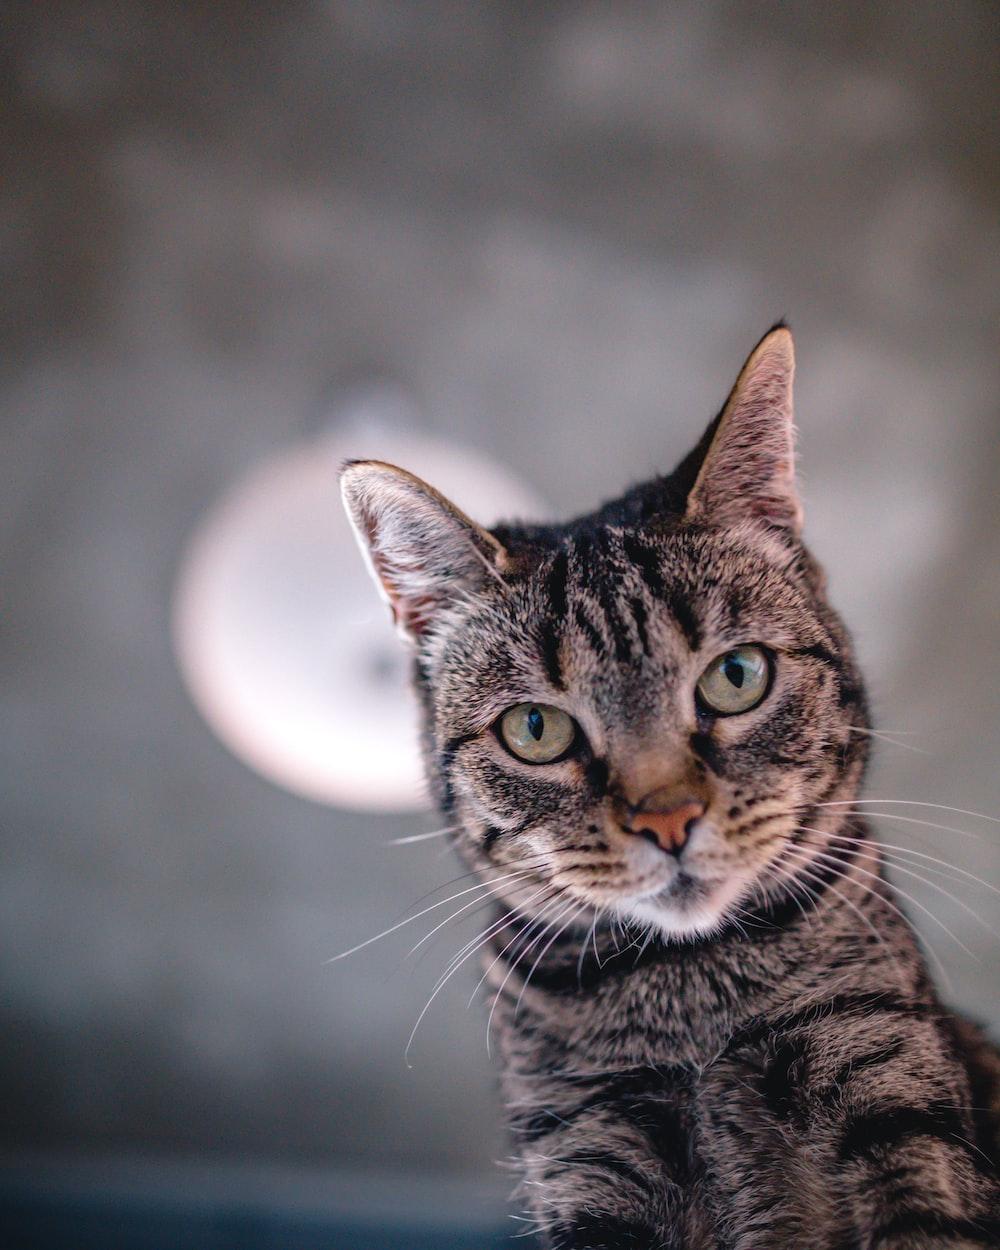 brown tabby cat looking up